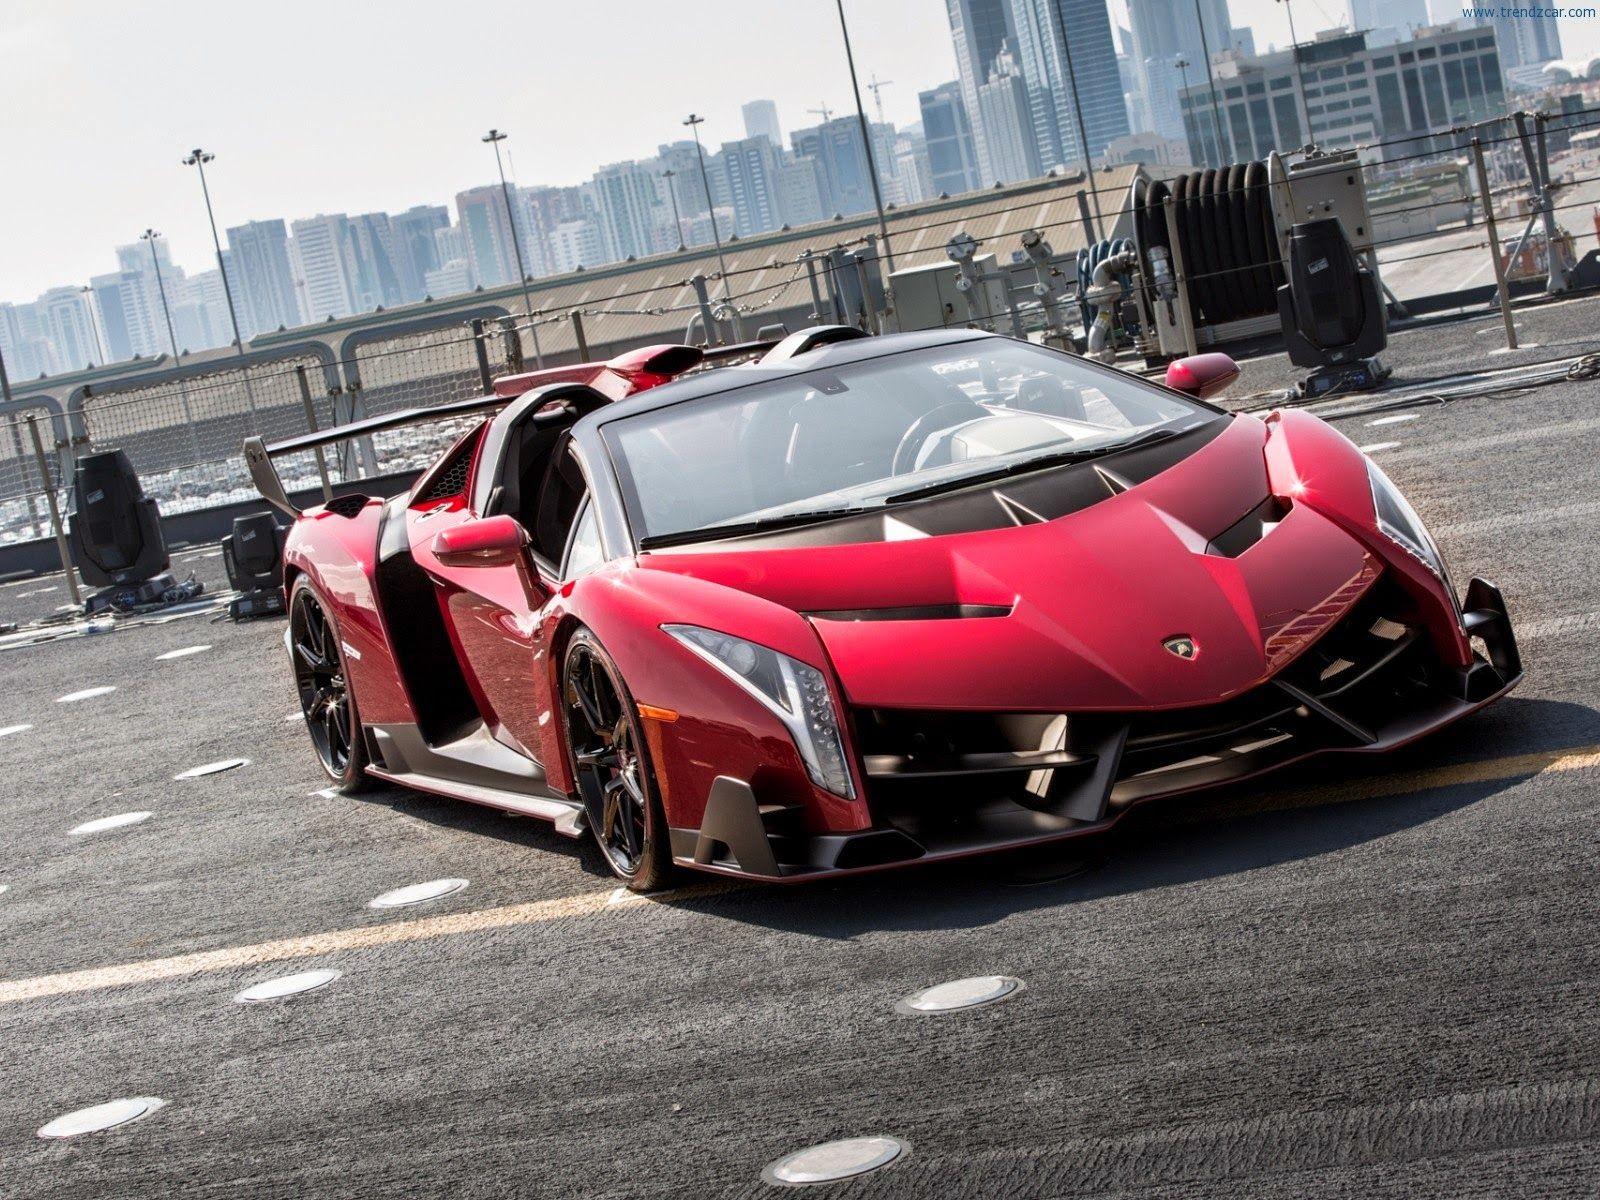 Lamborghini Veneno Roadster de 2014. 750 CV